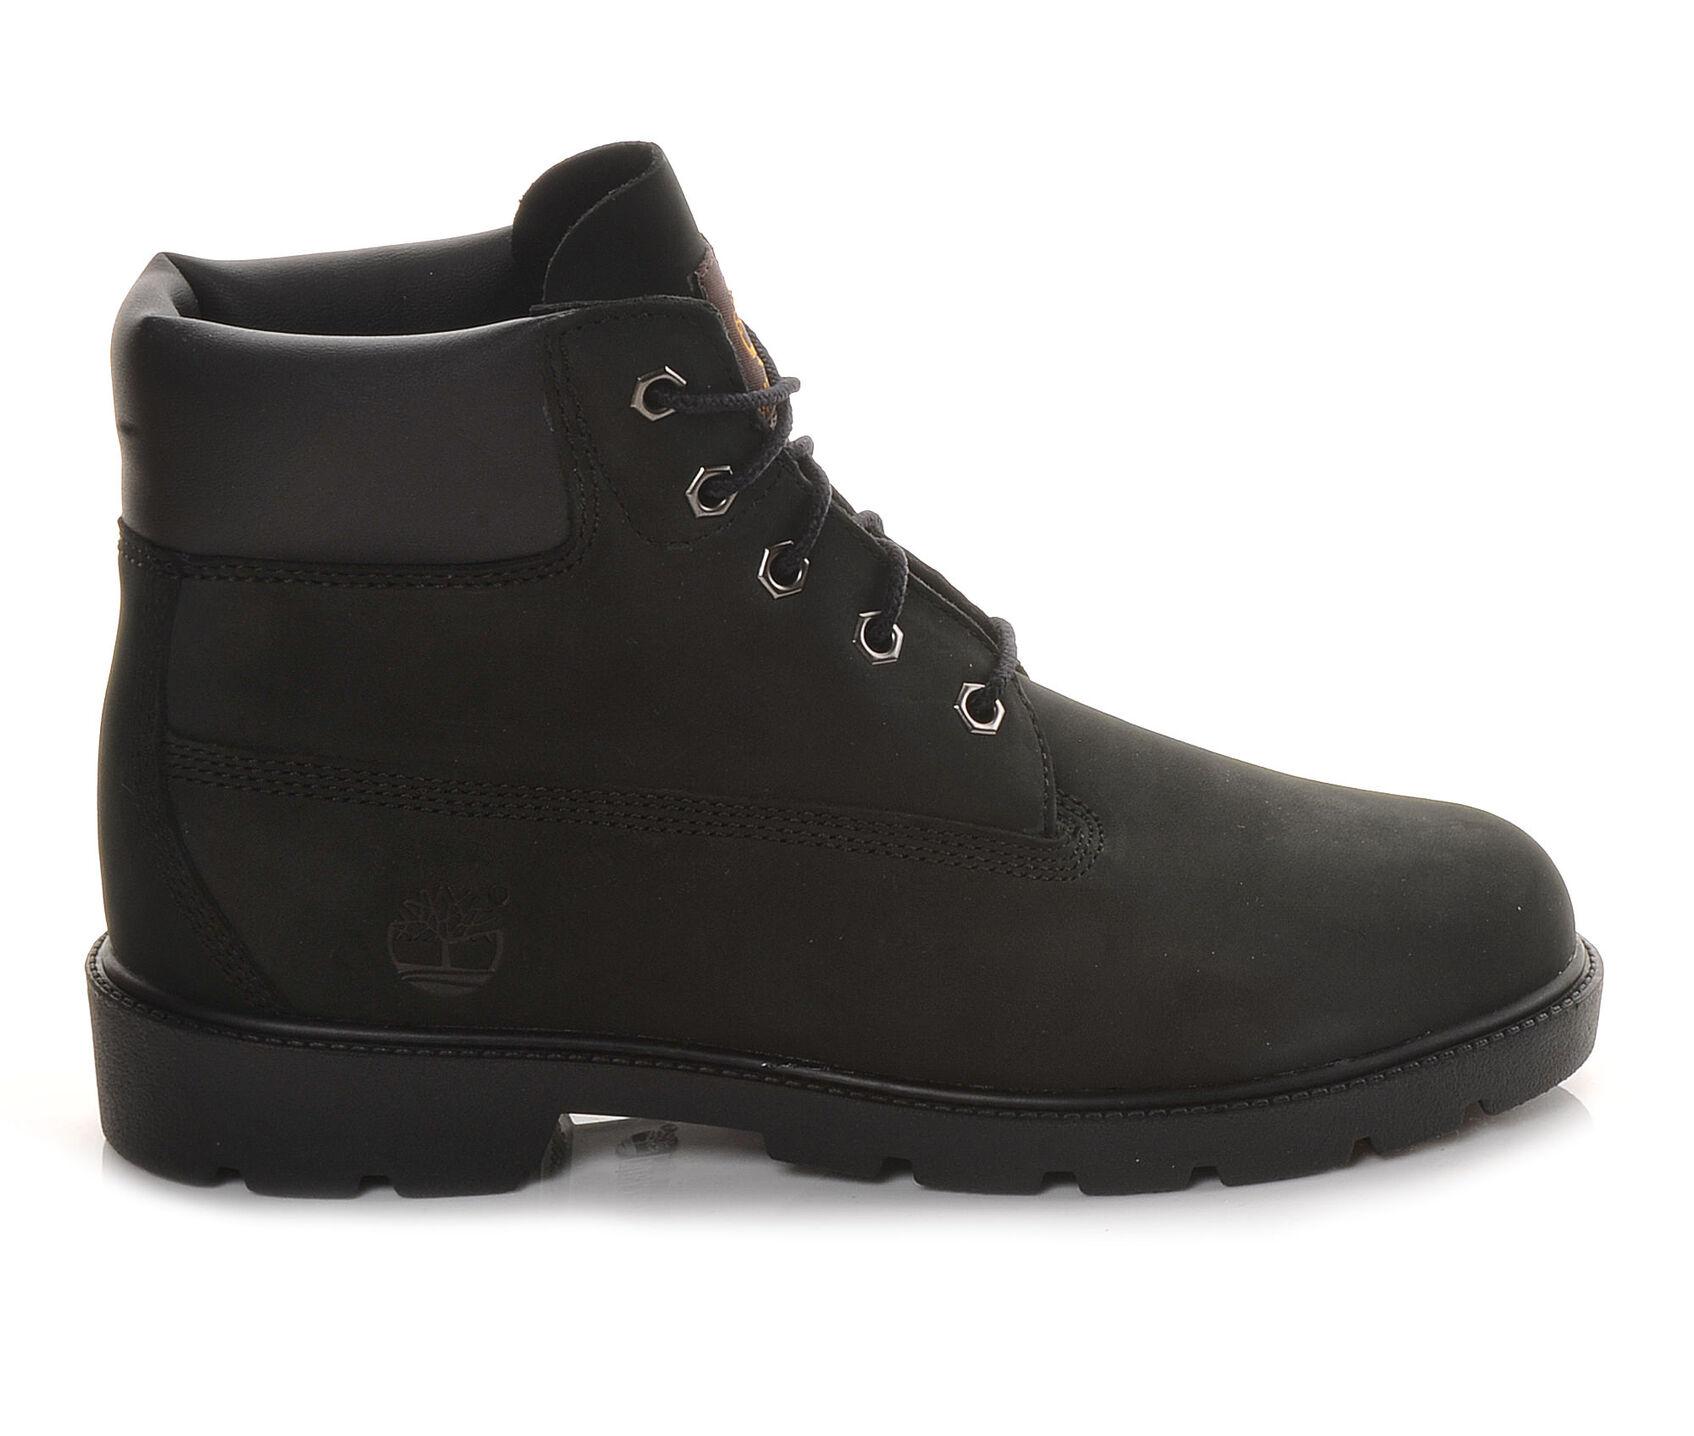 ddae7444c02 Boys' Timberland Big Kid 10910 6 Inch Classic Boots